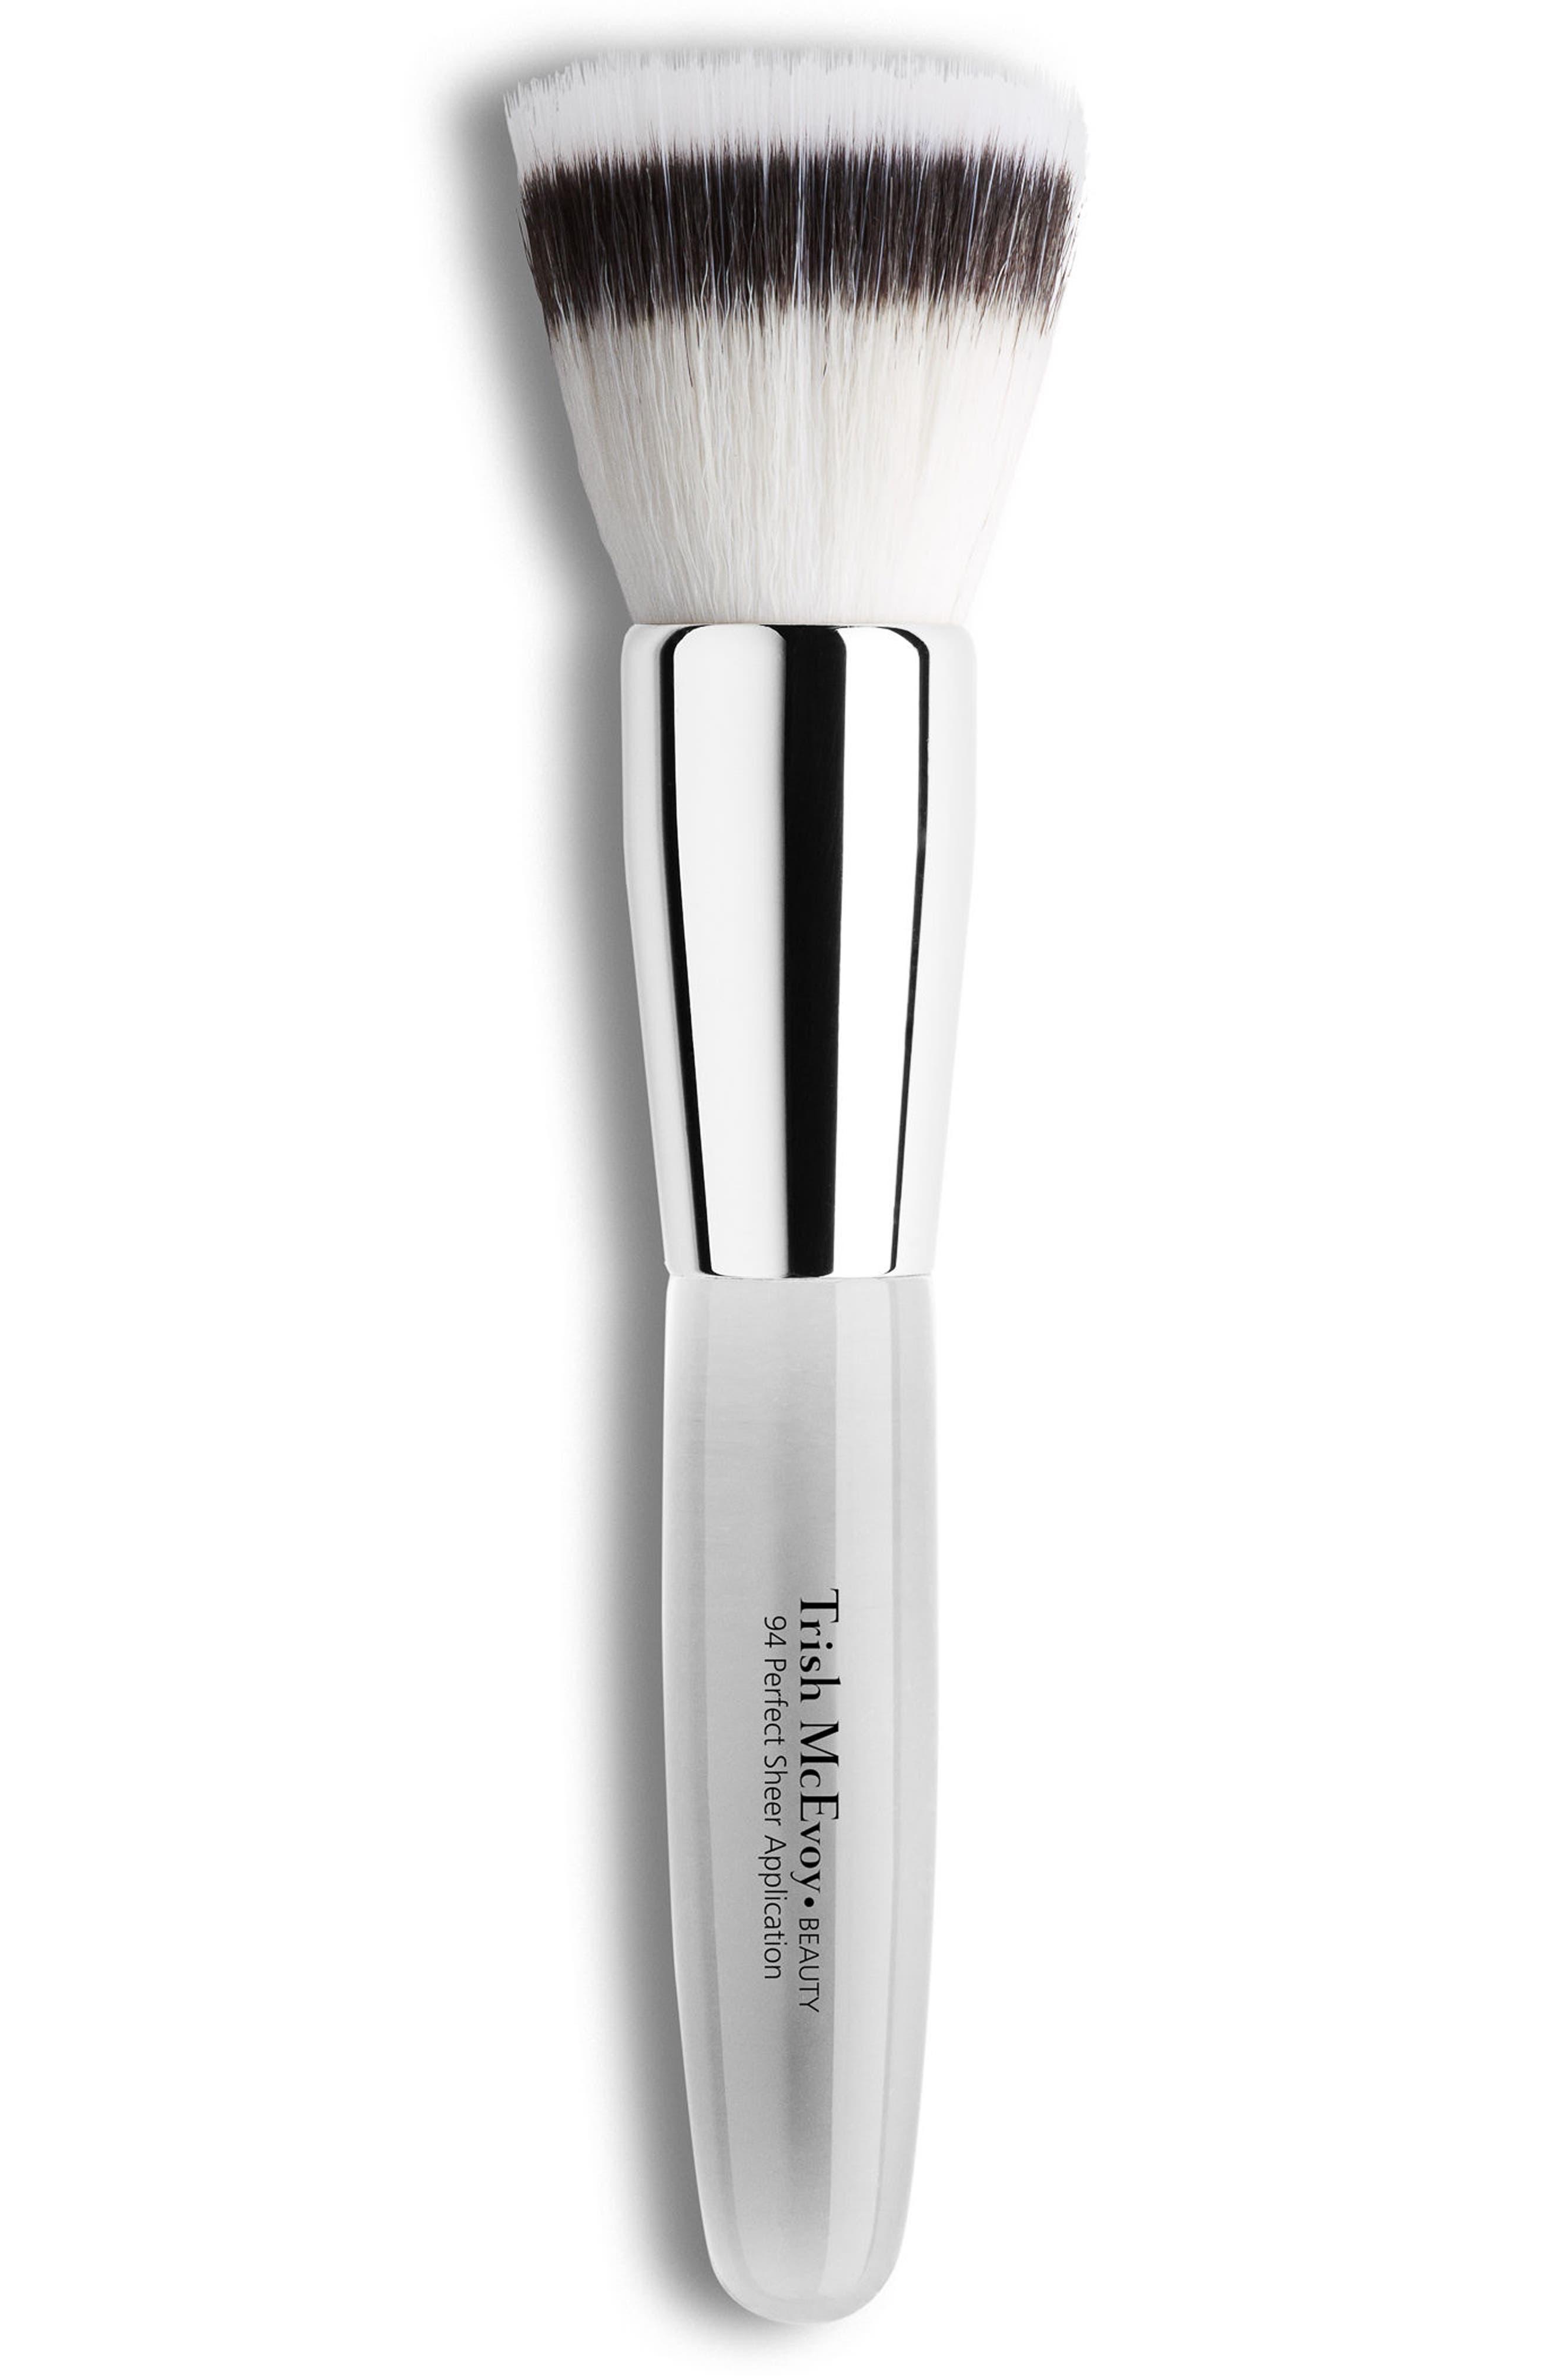 Trish McEvoy Perfect Sheer Application Brush